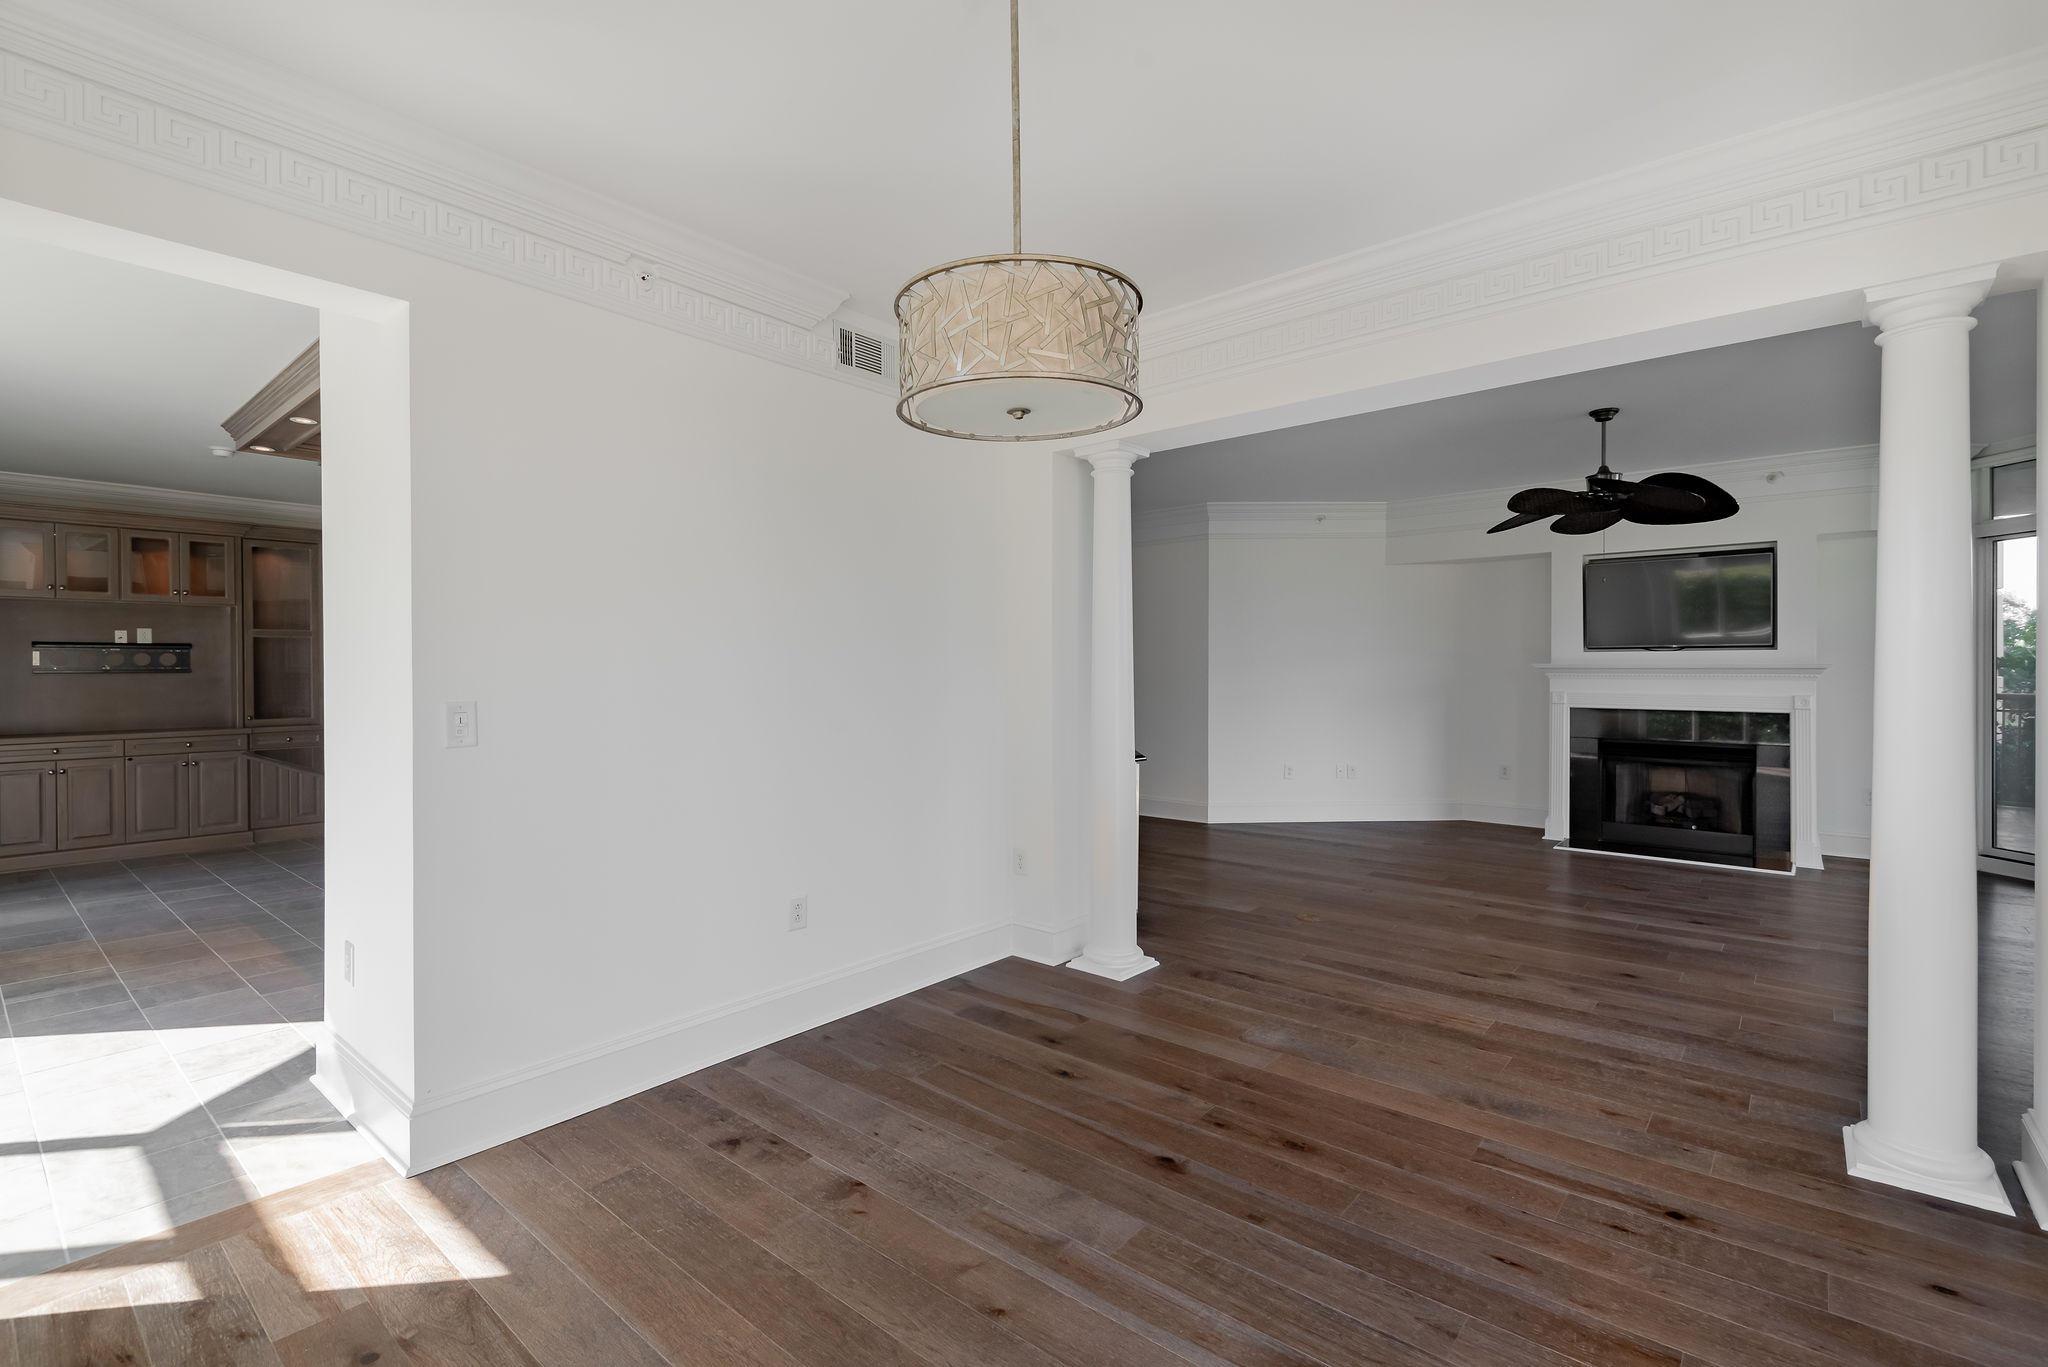 Renaissance On Chas Harbor Homes For Sale - 211 Plaza, Mount Pleasant, SC - 5